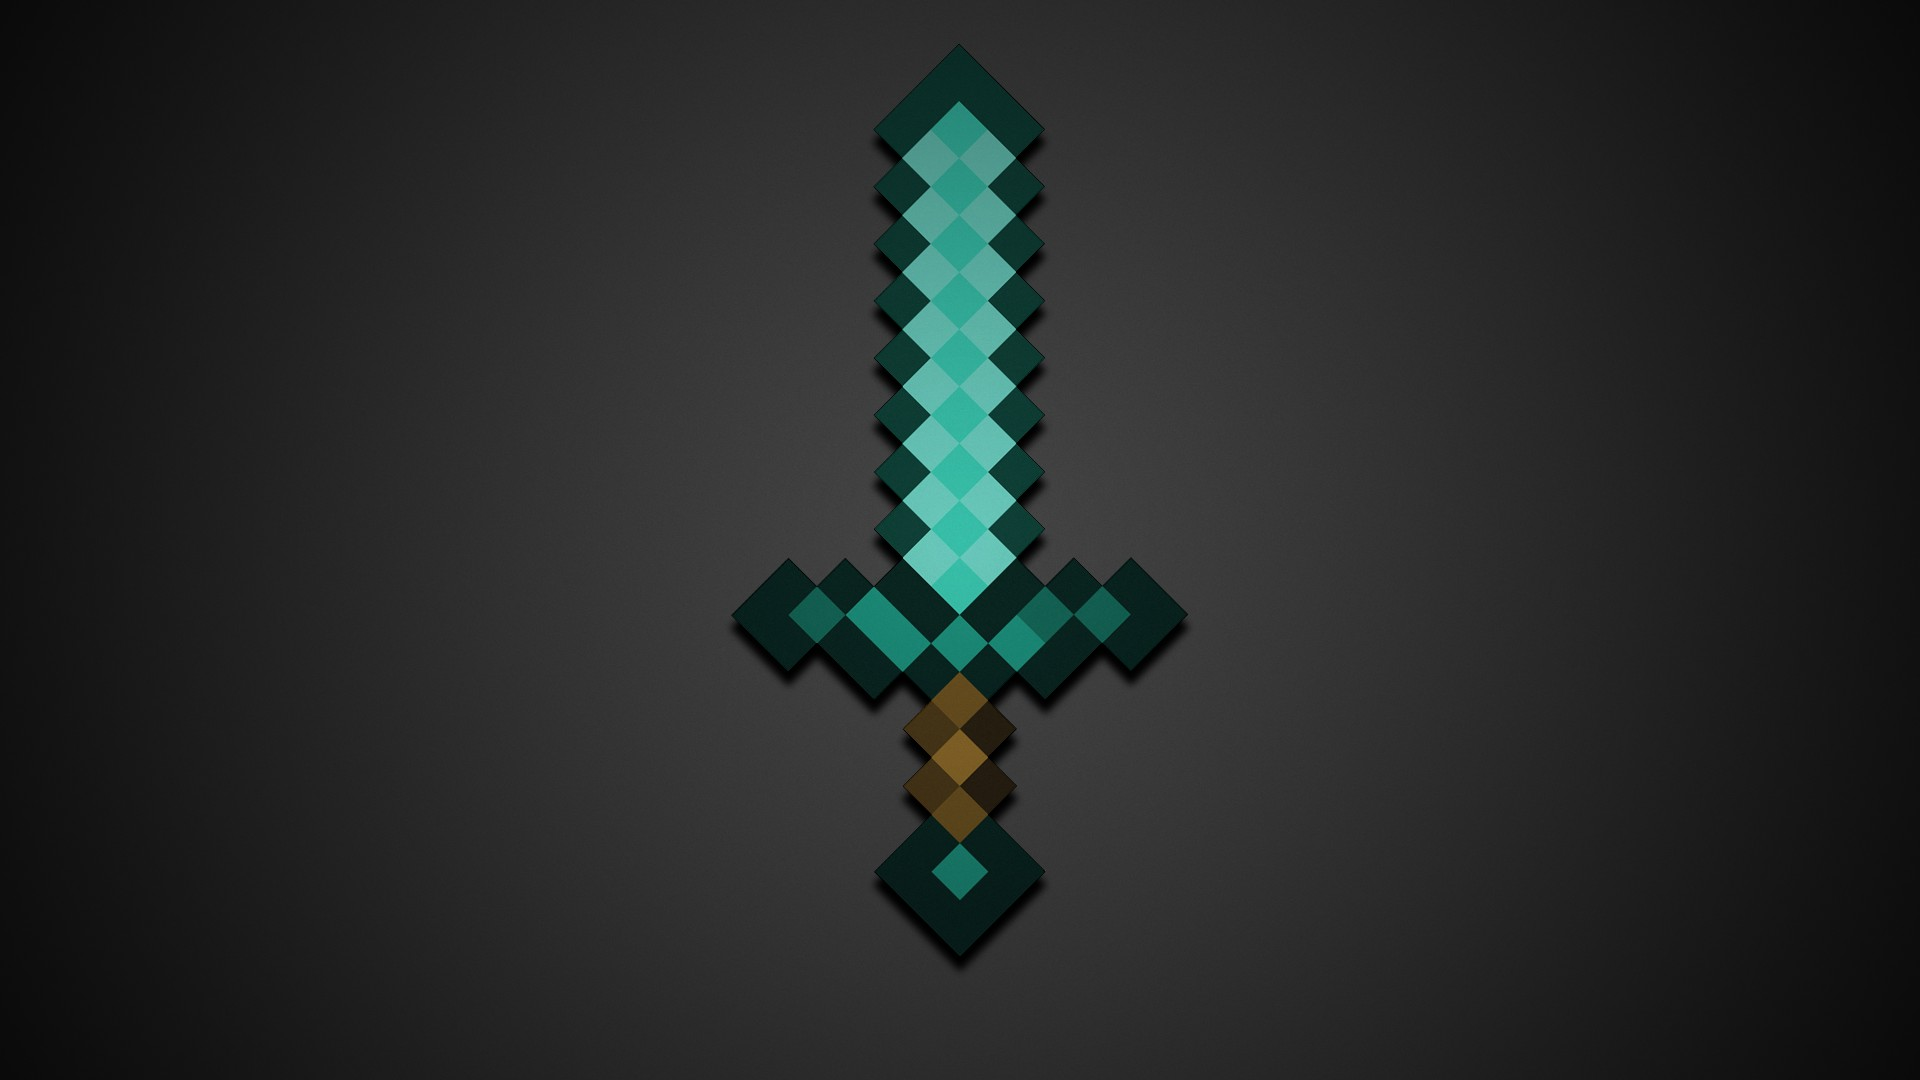 Minecraft Diamond Sword HD Wallpaper 1920x1080